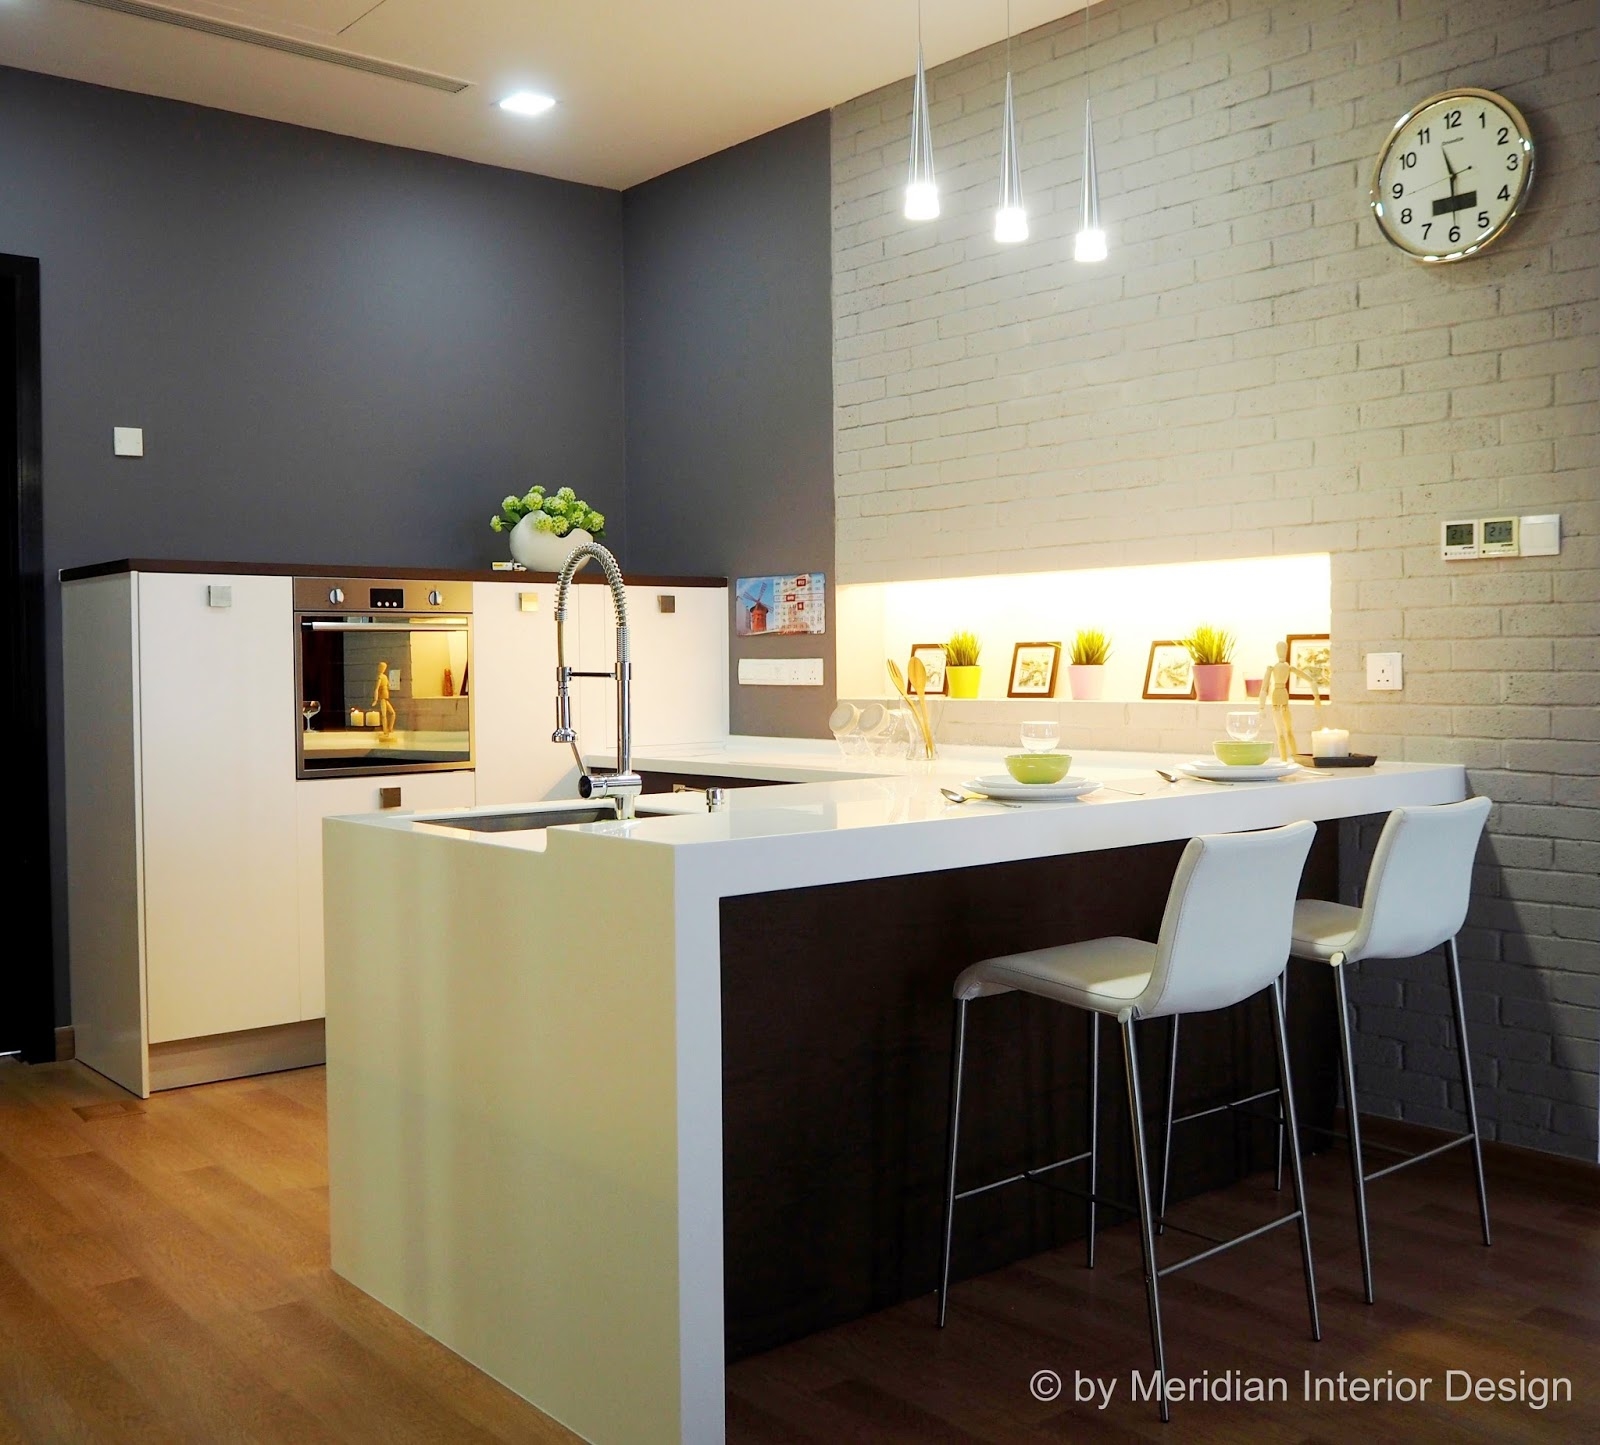 Interior Design And Kitchen Design, In Kuala